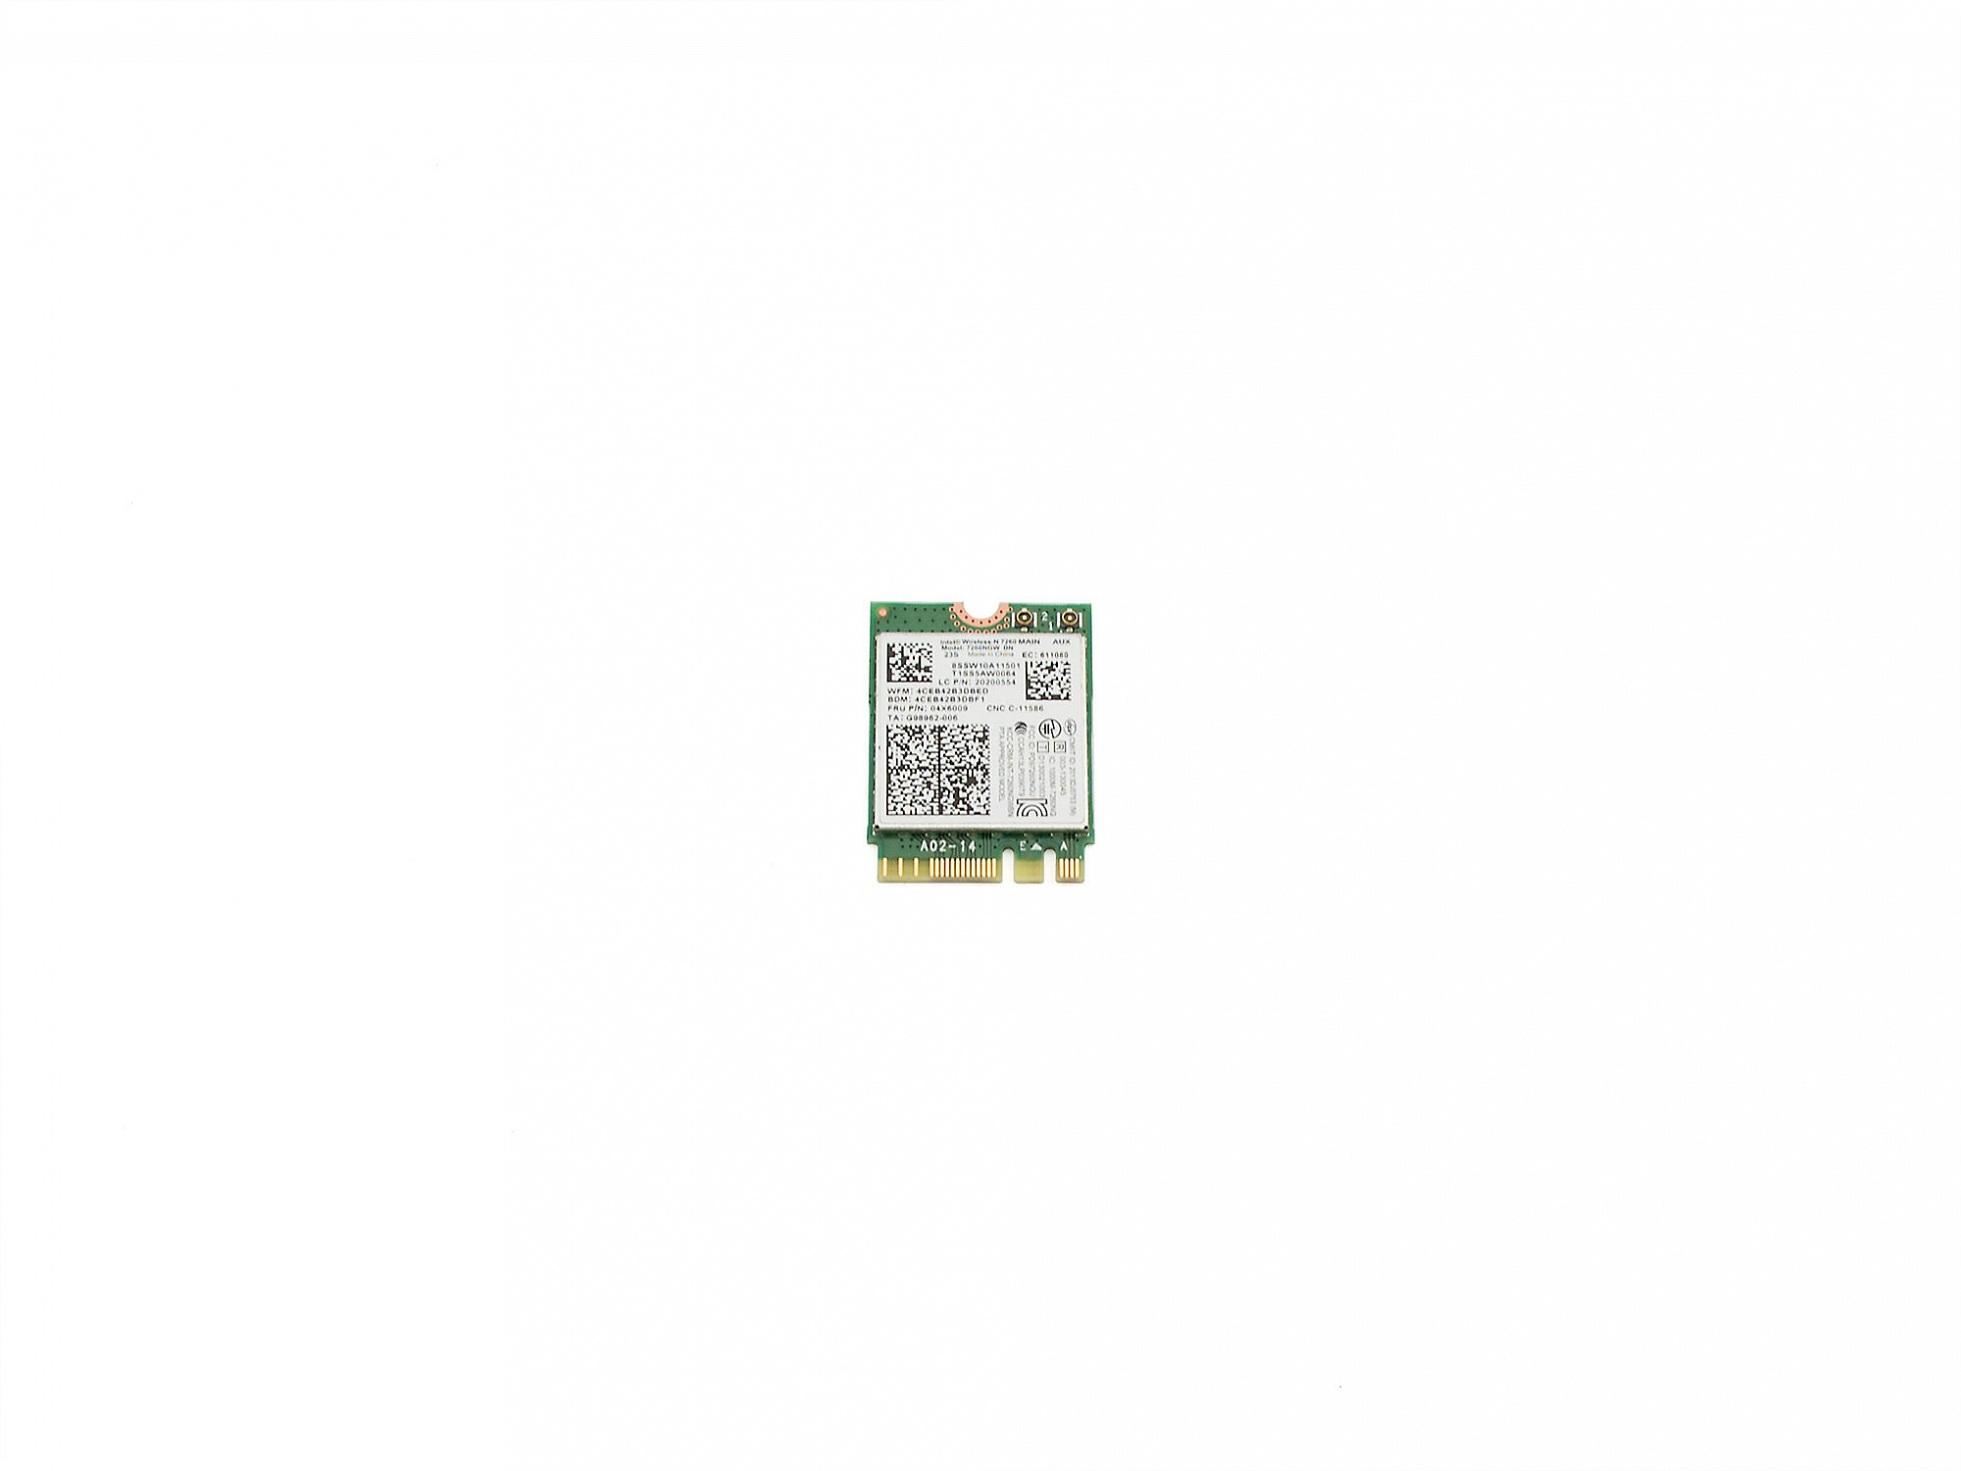 Intel Wireless-N 7260 MAIN für Lenovo ThinkPad W541 Serie